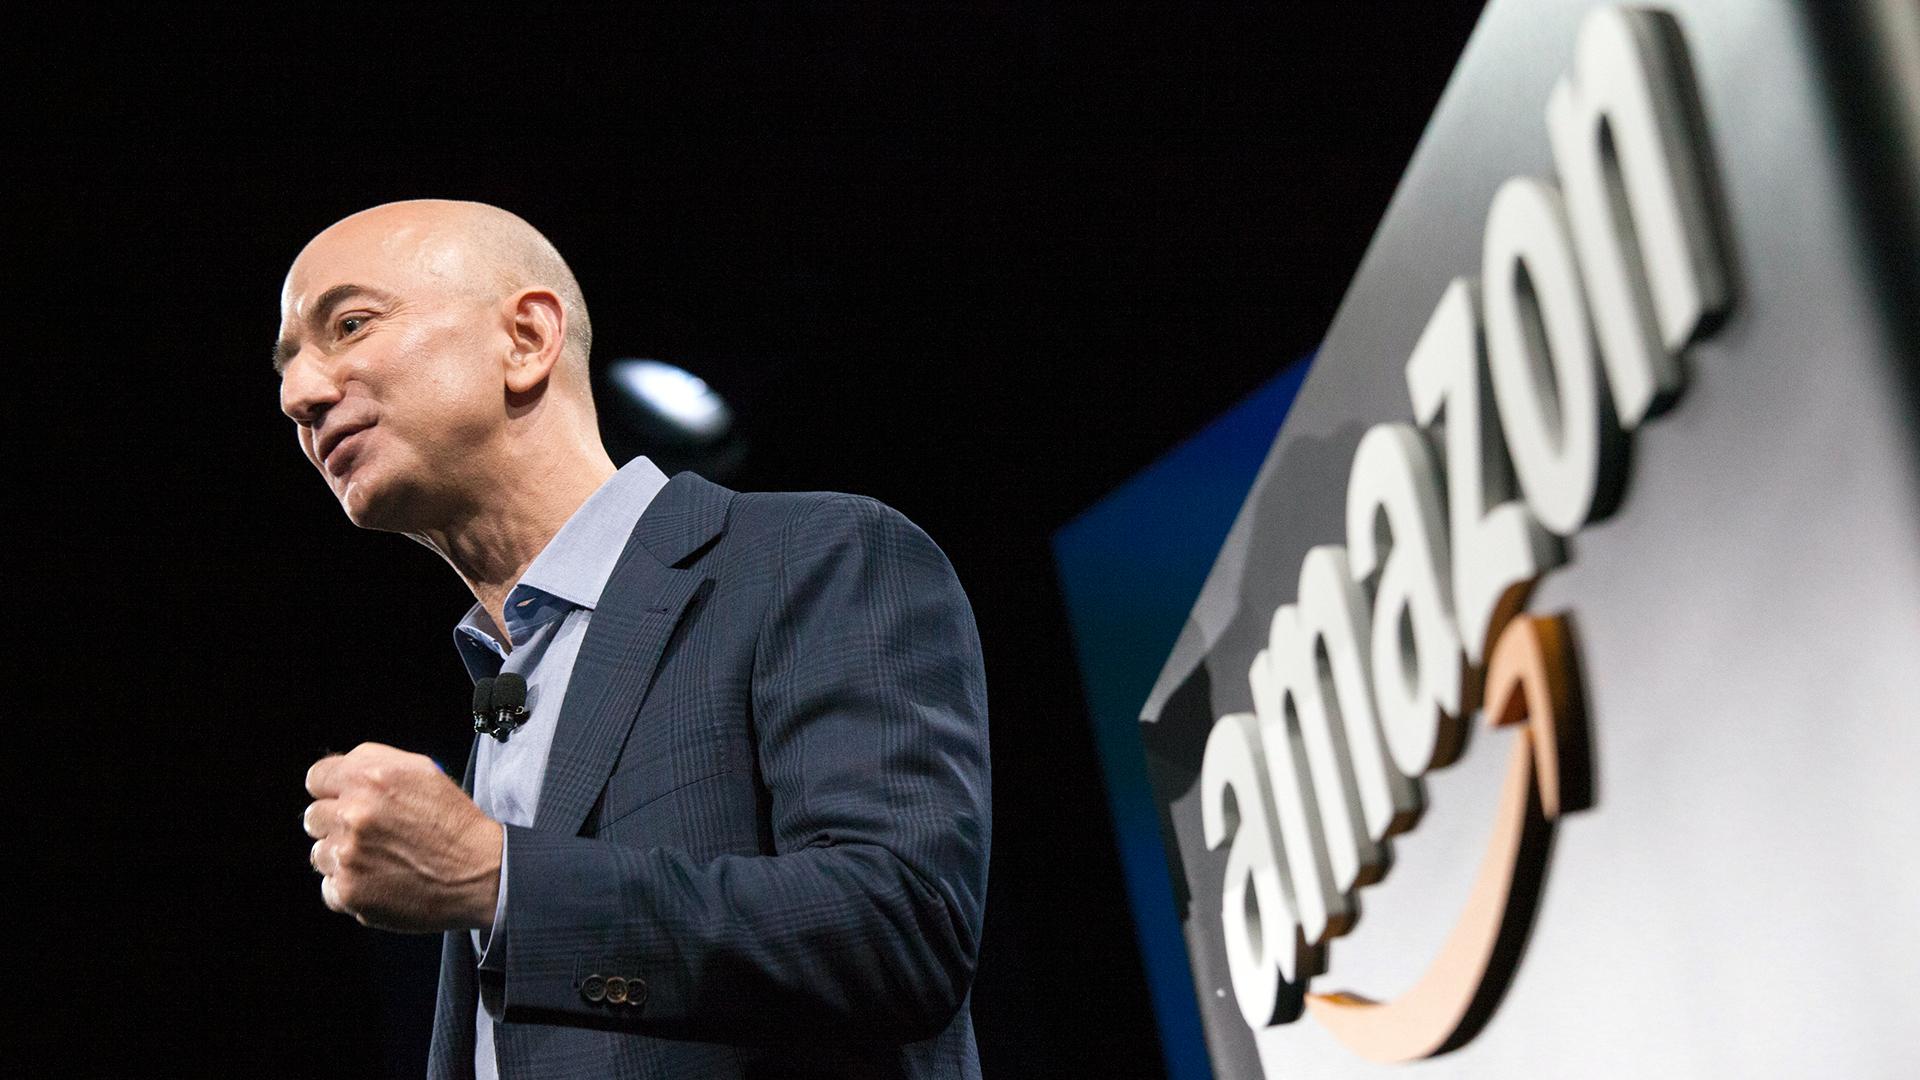 Amazon founder CEO Jeff Bezos-159532.jpg84616451